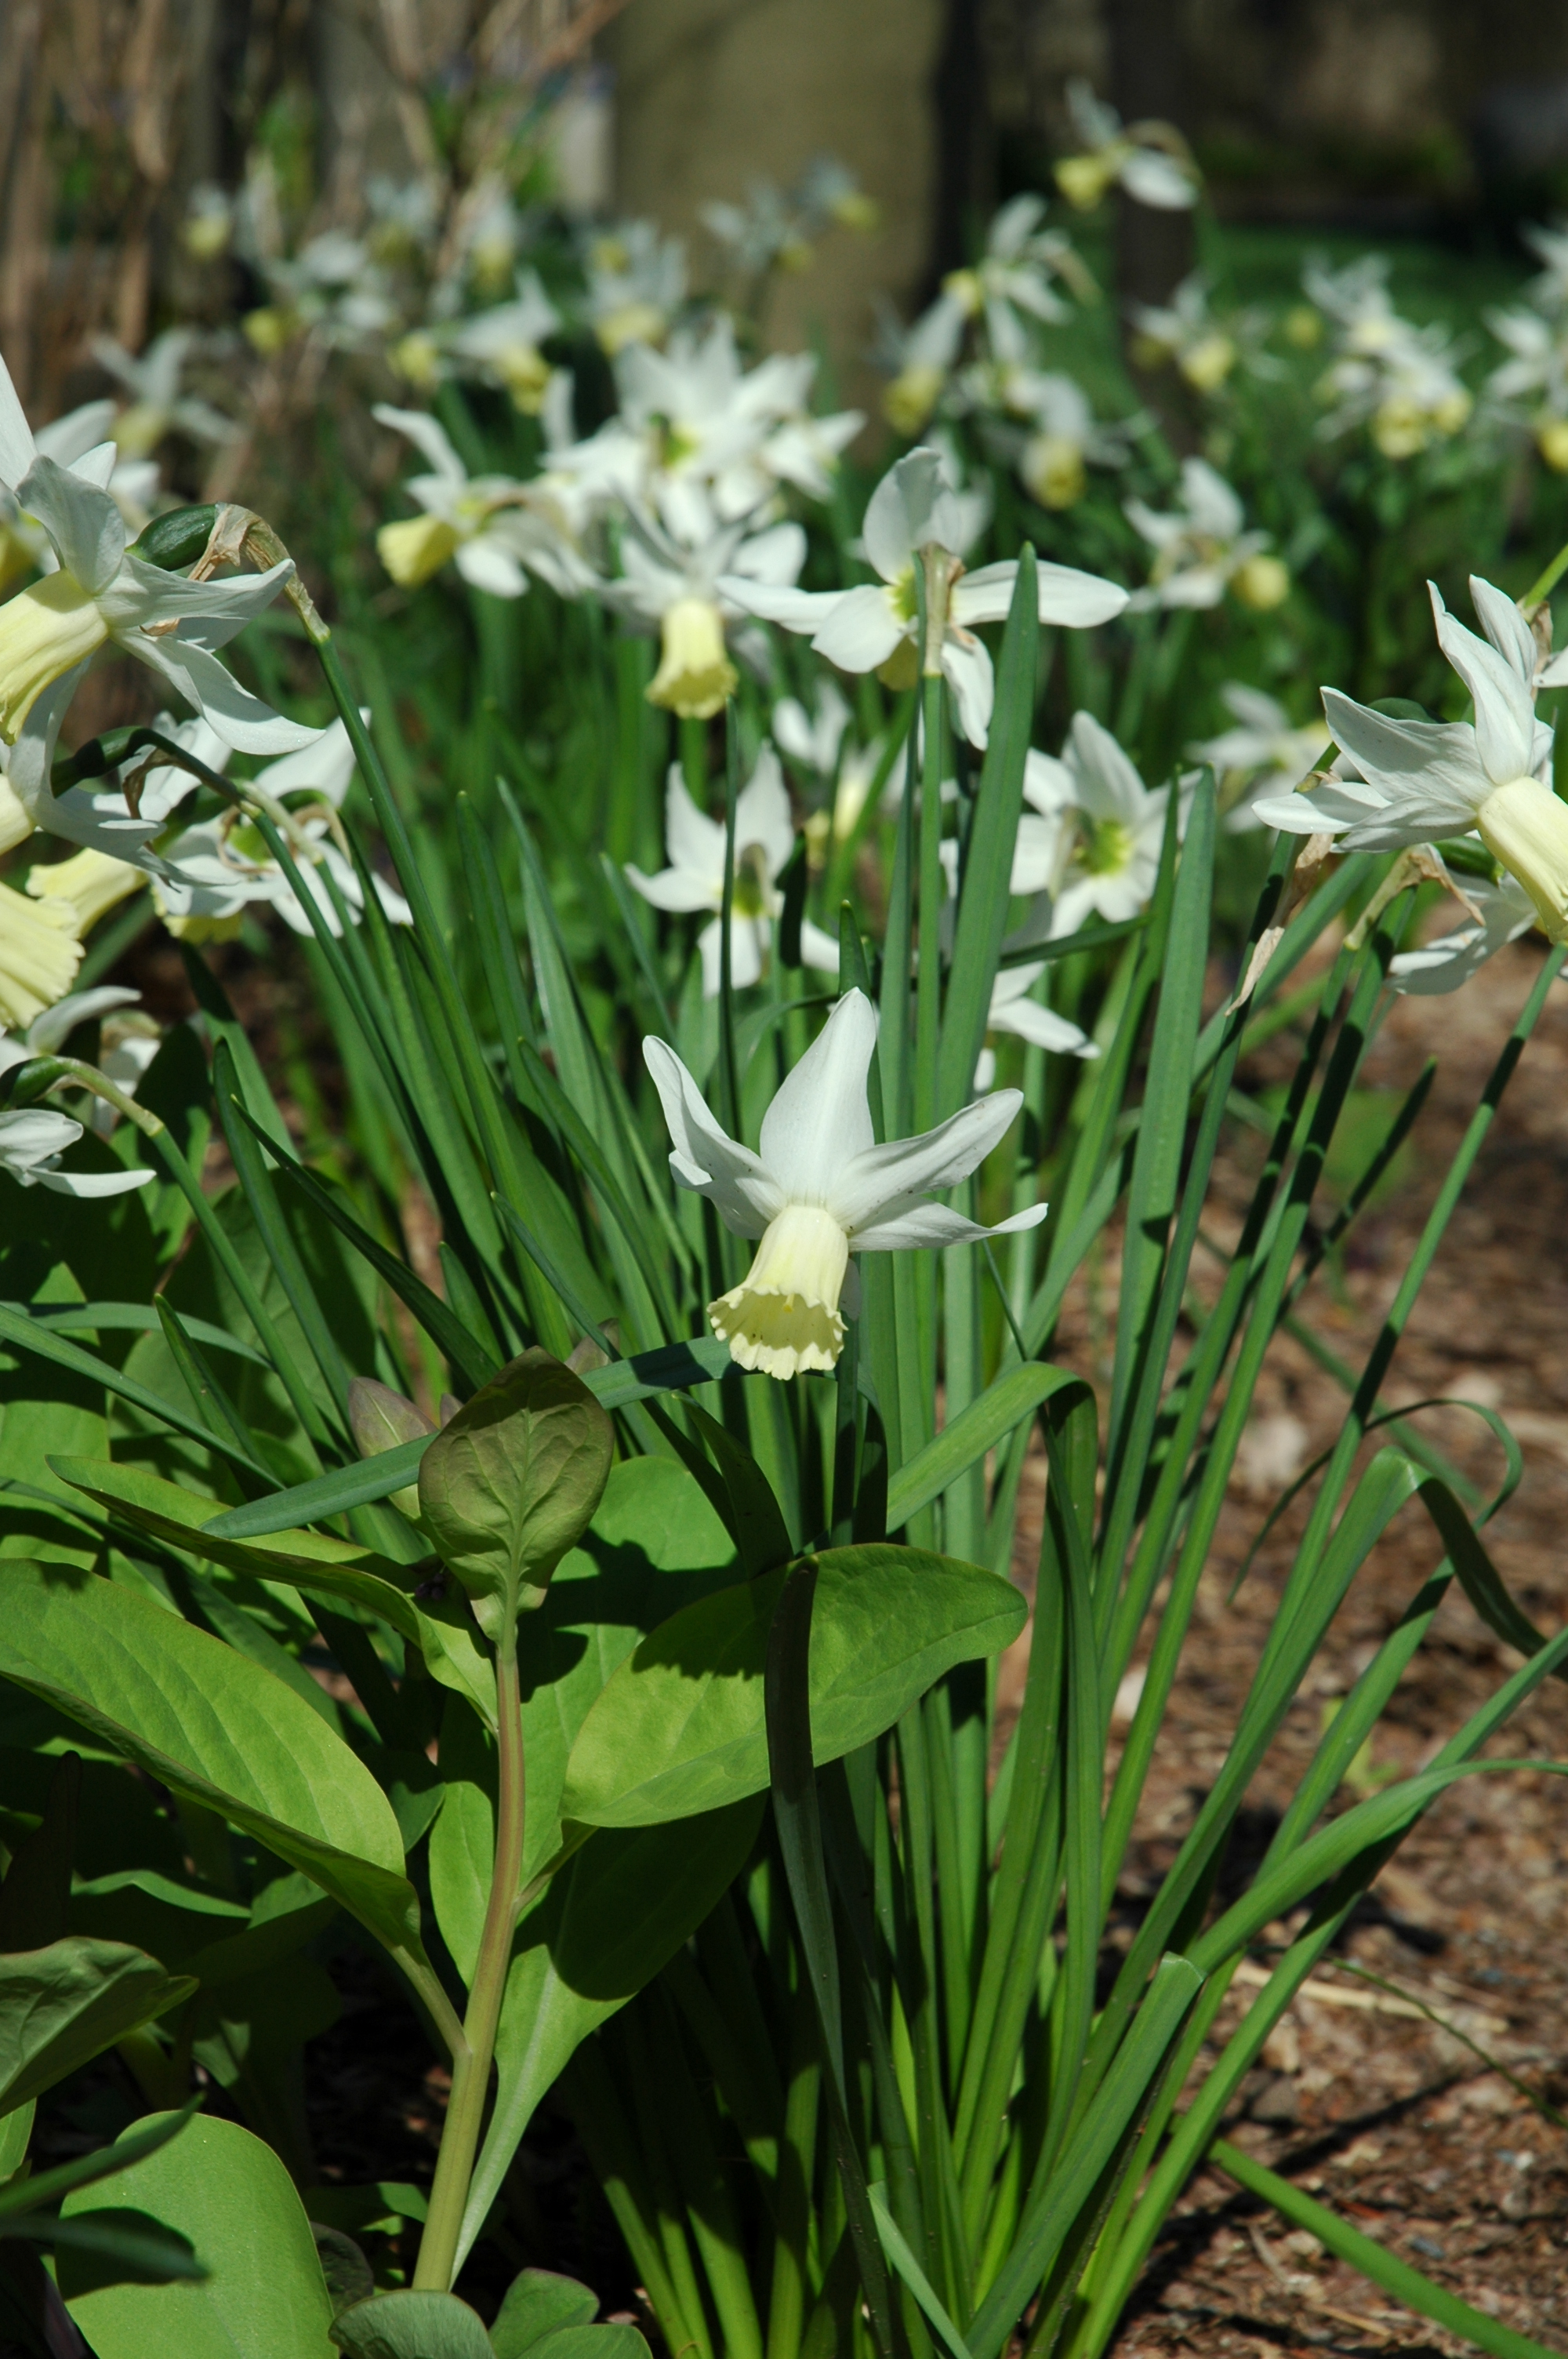 Legends/myths about flowers?